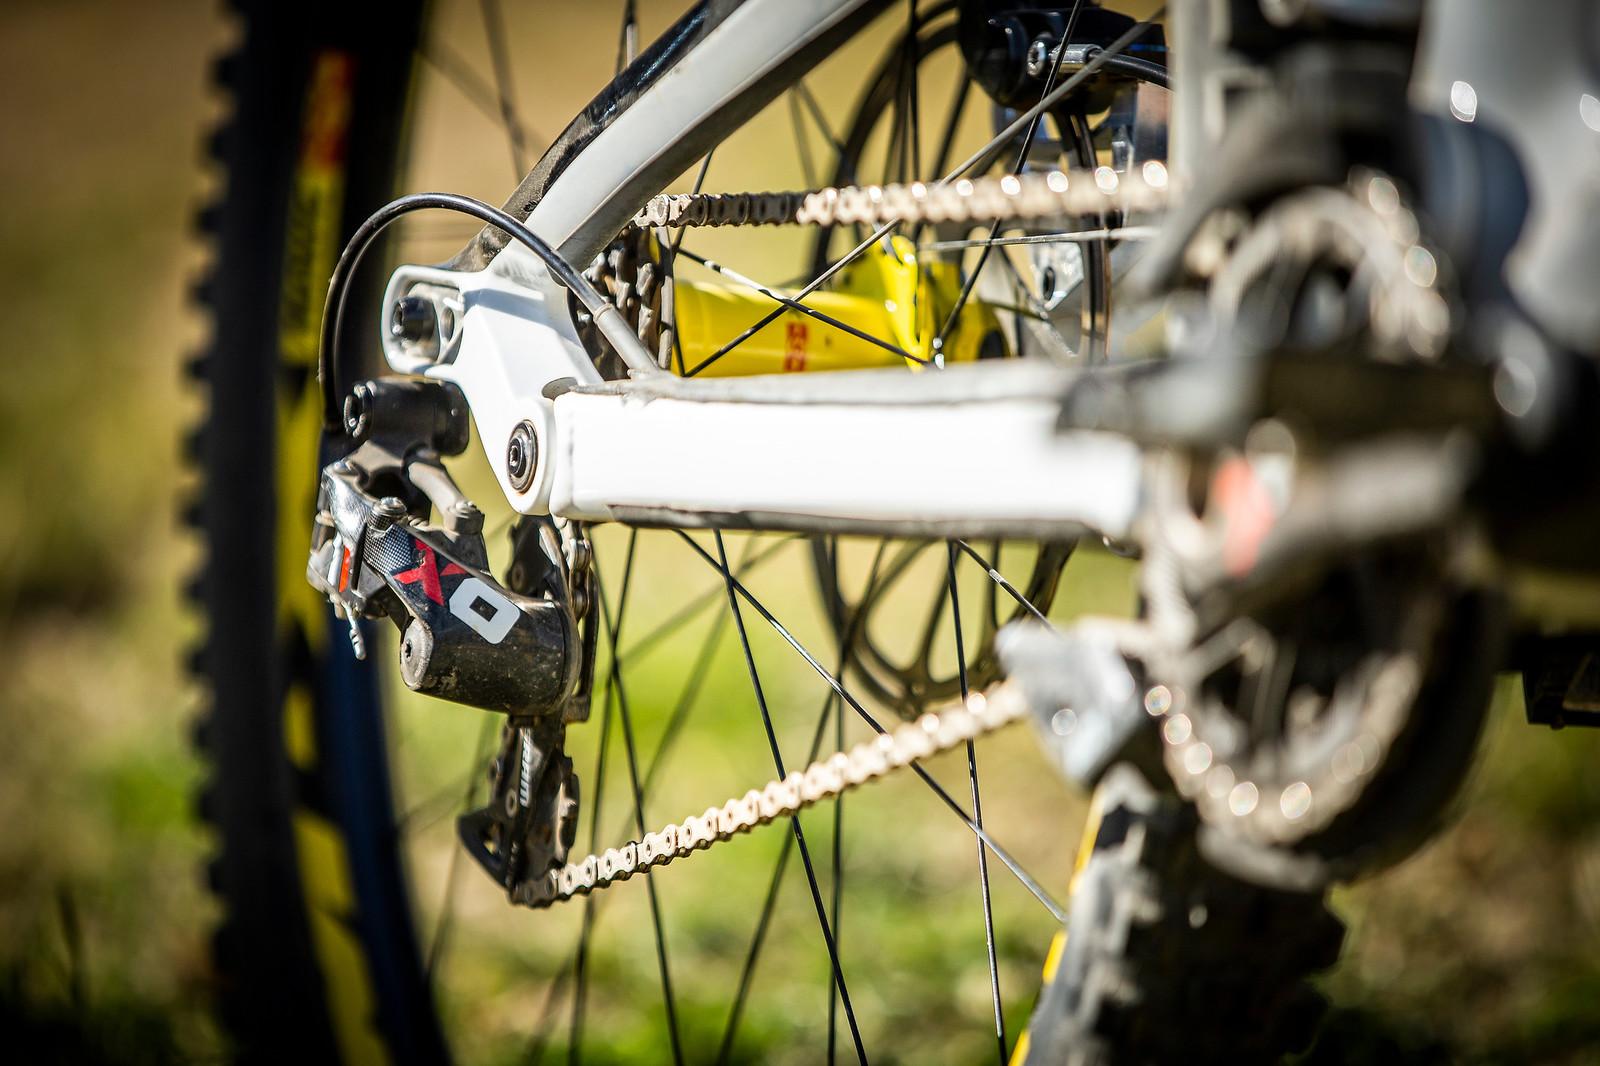 SRAM X01 DH 7-Speed Drivetrain - WINNING BIKE - Troy Brosnan's Canyon Sender - Mountain Biking Pictures - Vital MTB